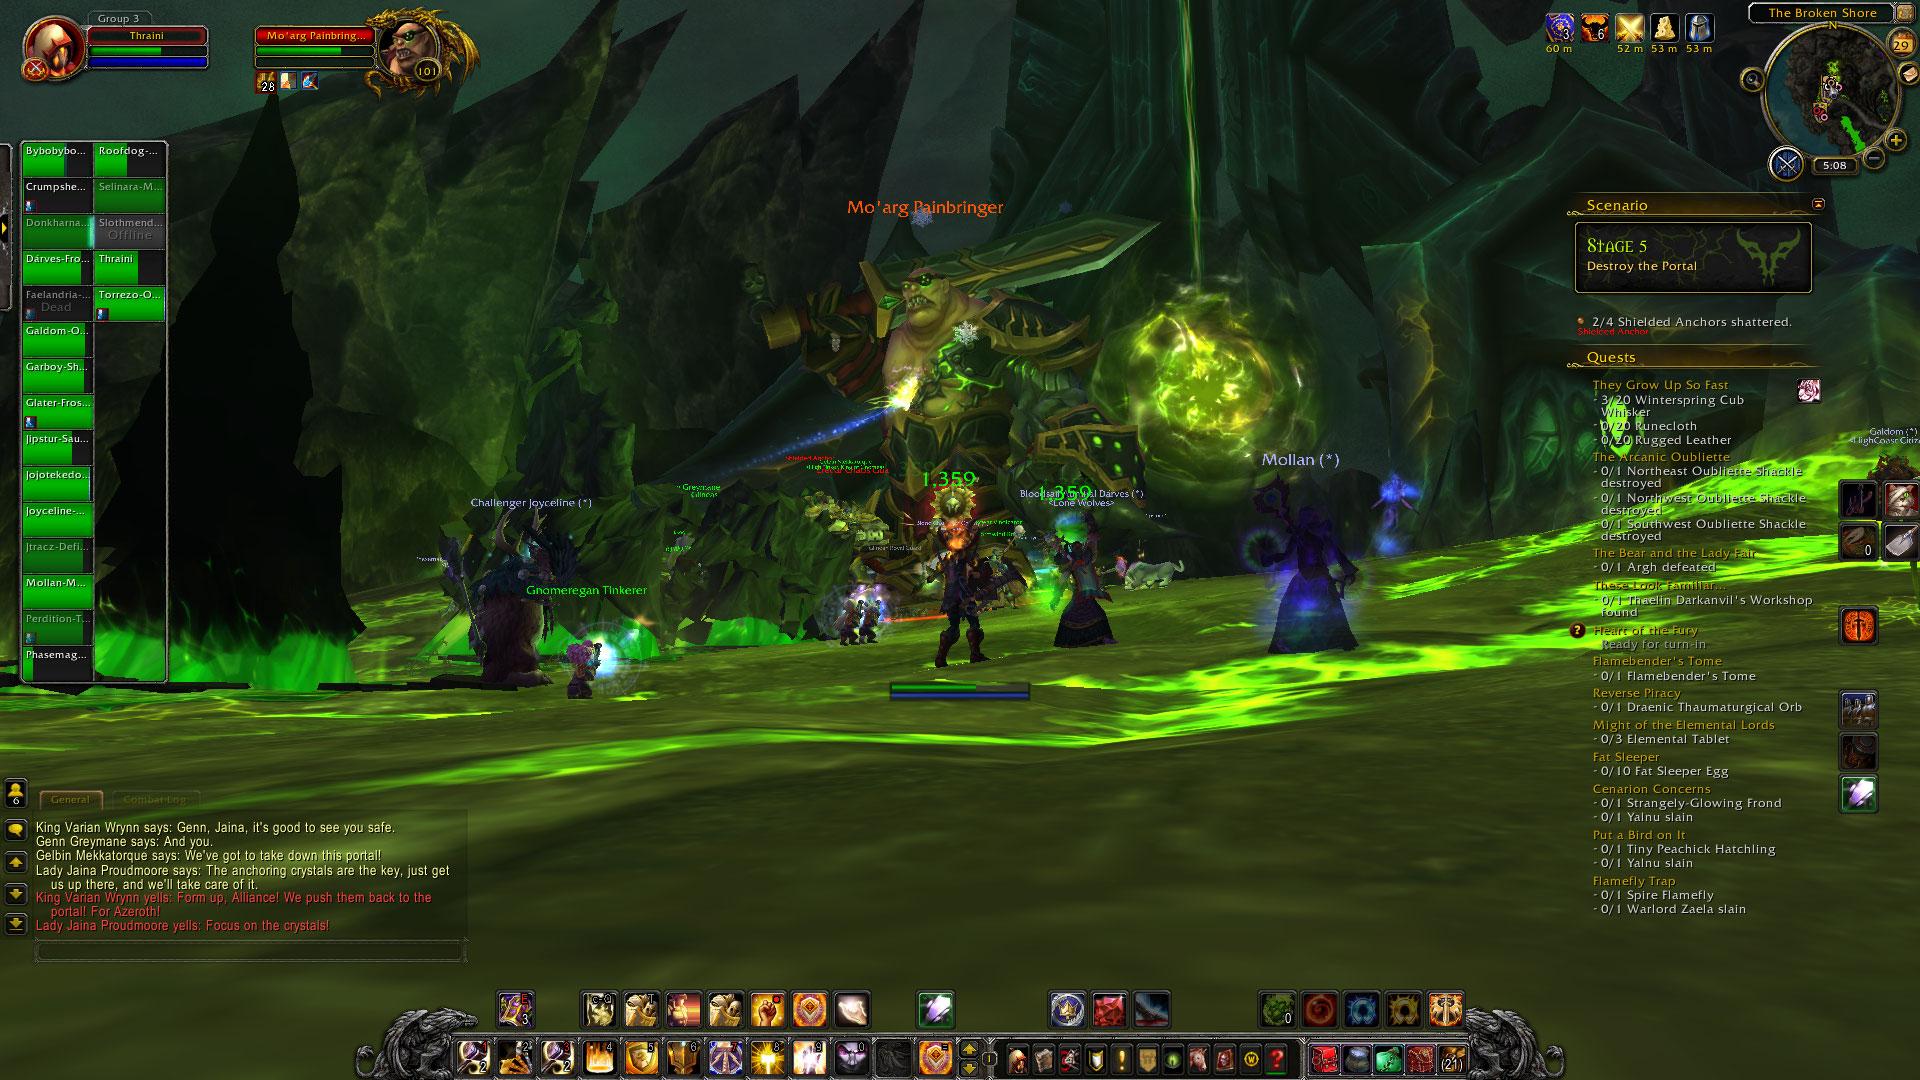 World of Warcraft: Legion fotoseriál - Plamenná legie přichází 129833